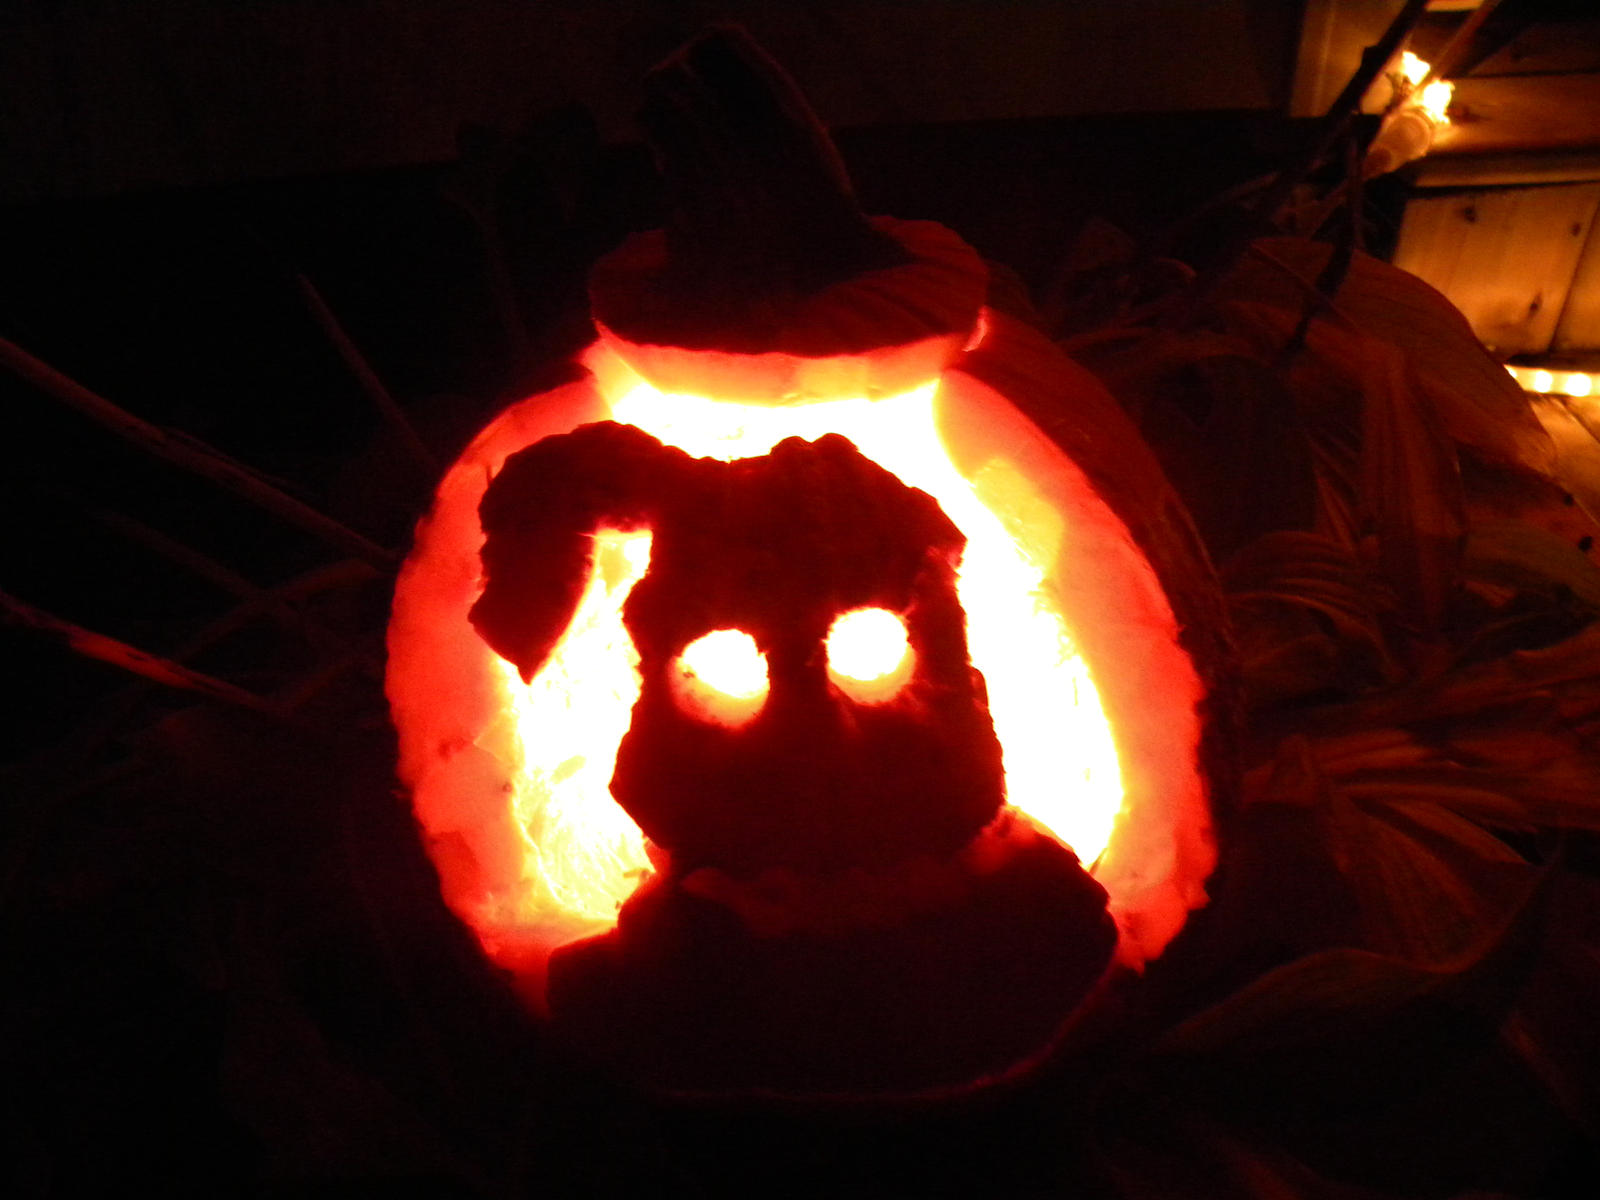 Oogie Boogie Pumpkin Carving Template – images free download - Oogie ...